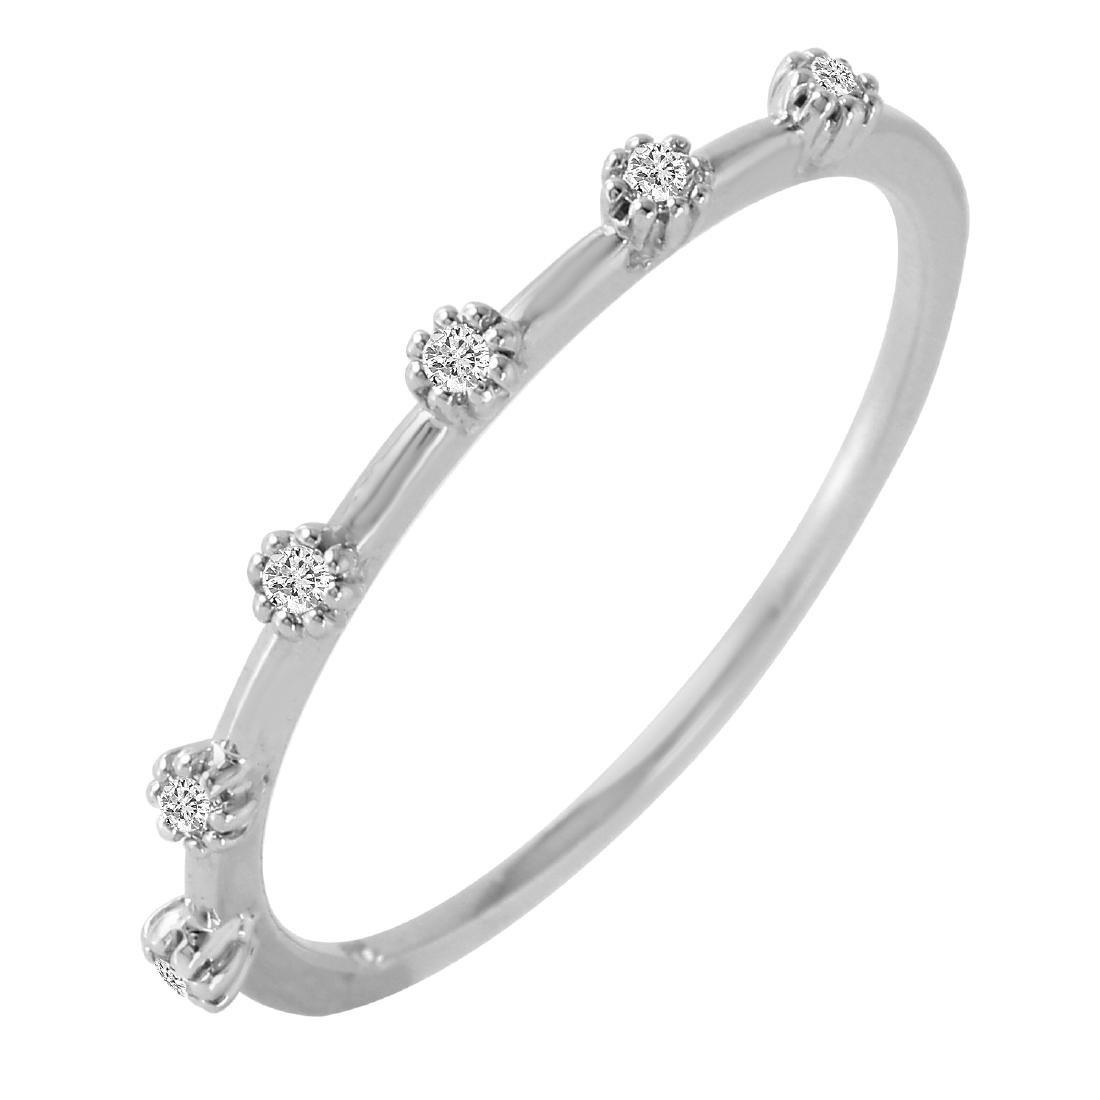 0.09 Carat Natural Diamond 18K Solid White Gold Ring